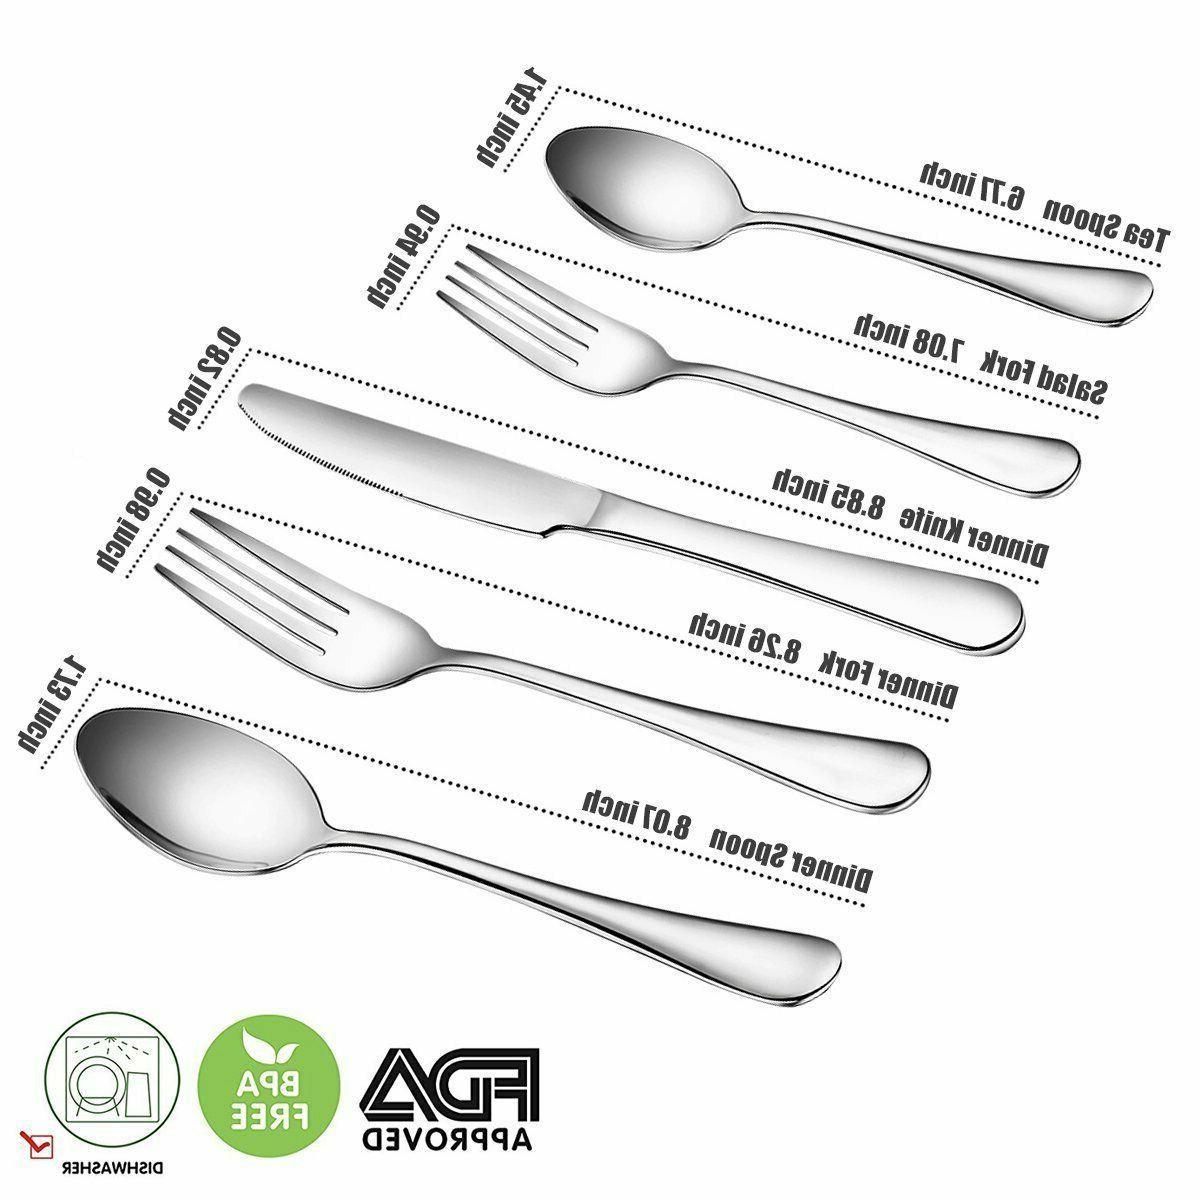 Silverware Set Dinner Forks and Spoons Dinner